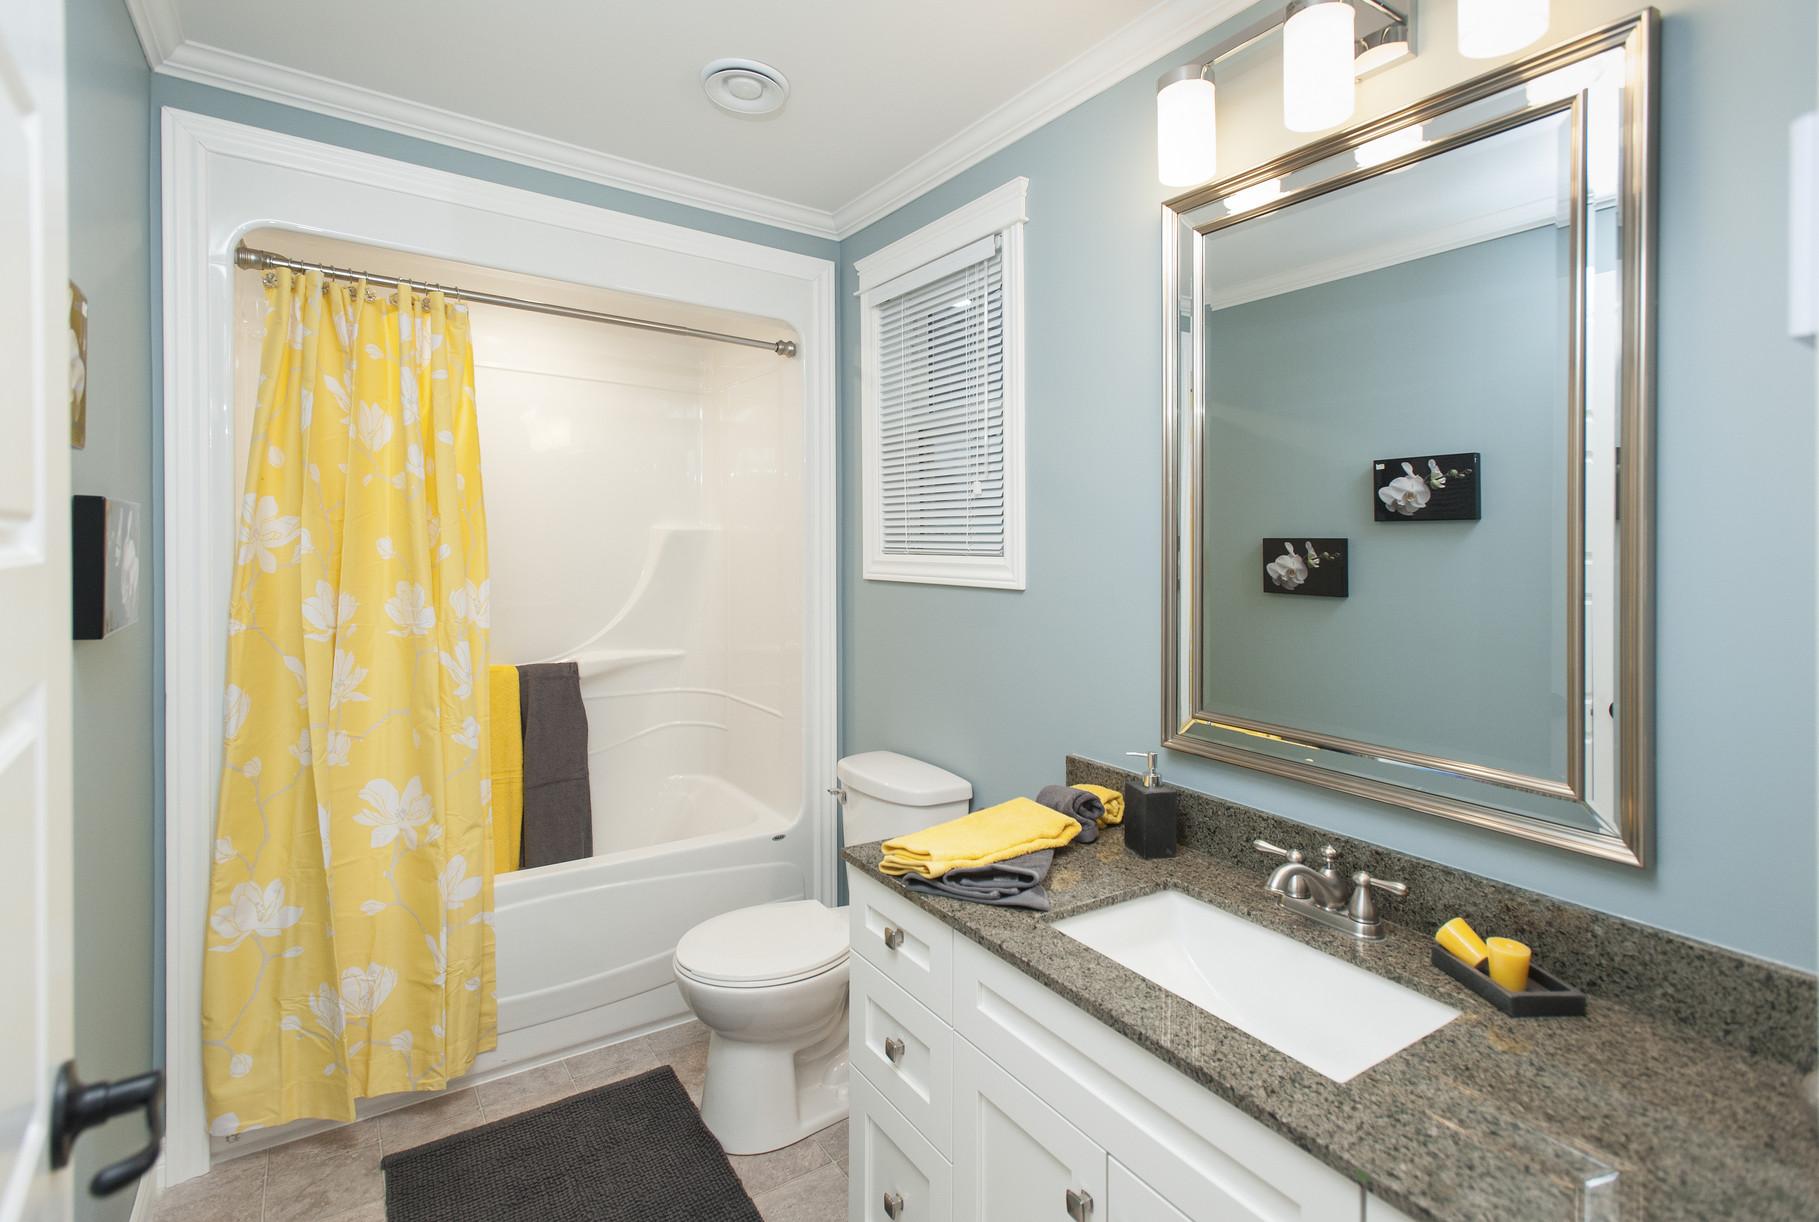 Vast range of bathroom options and finishes